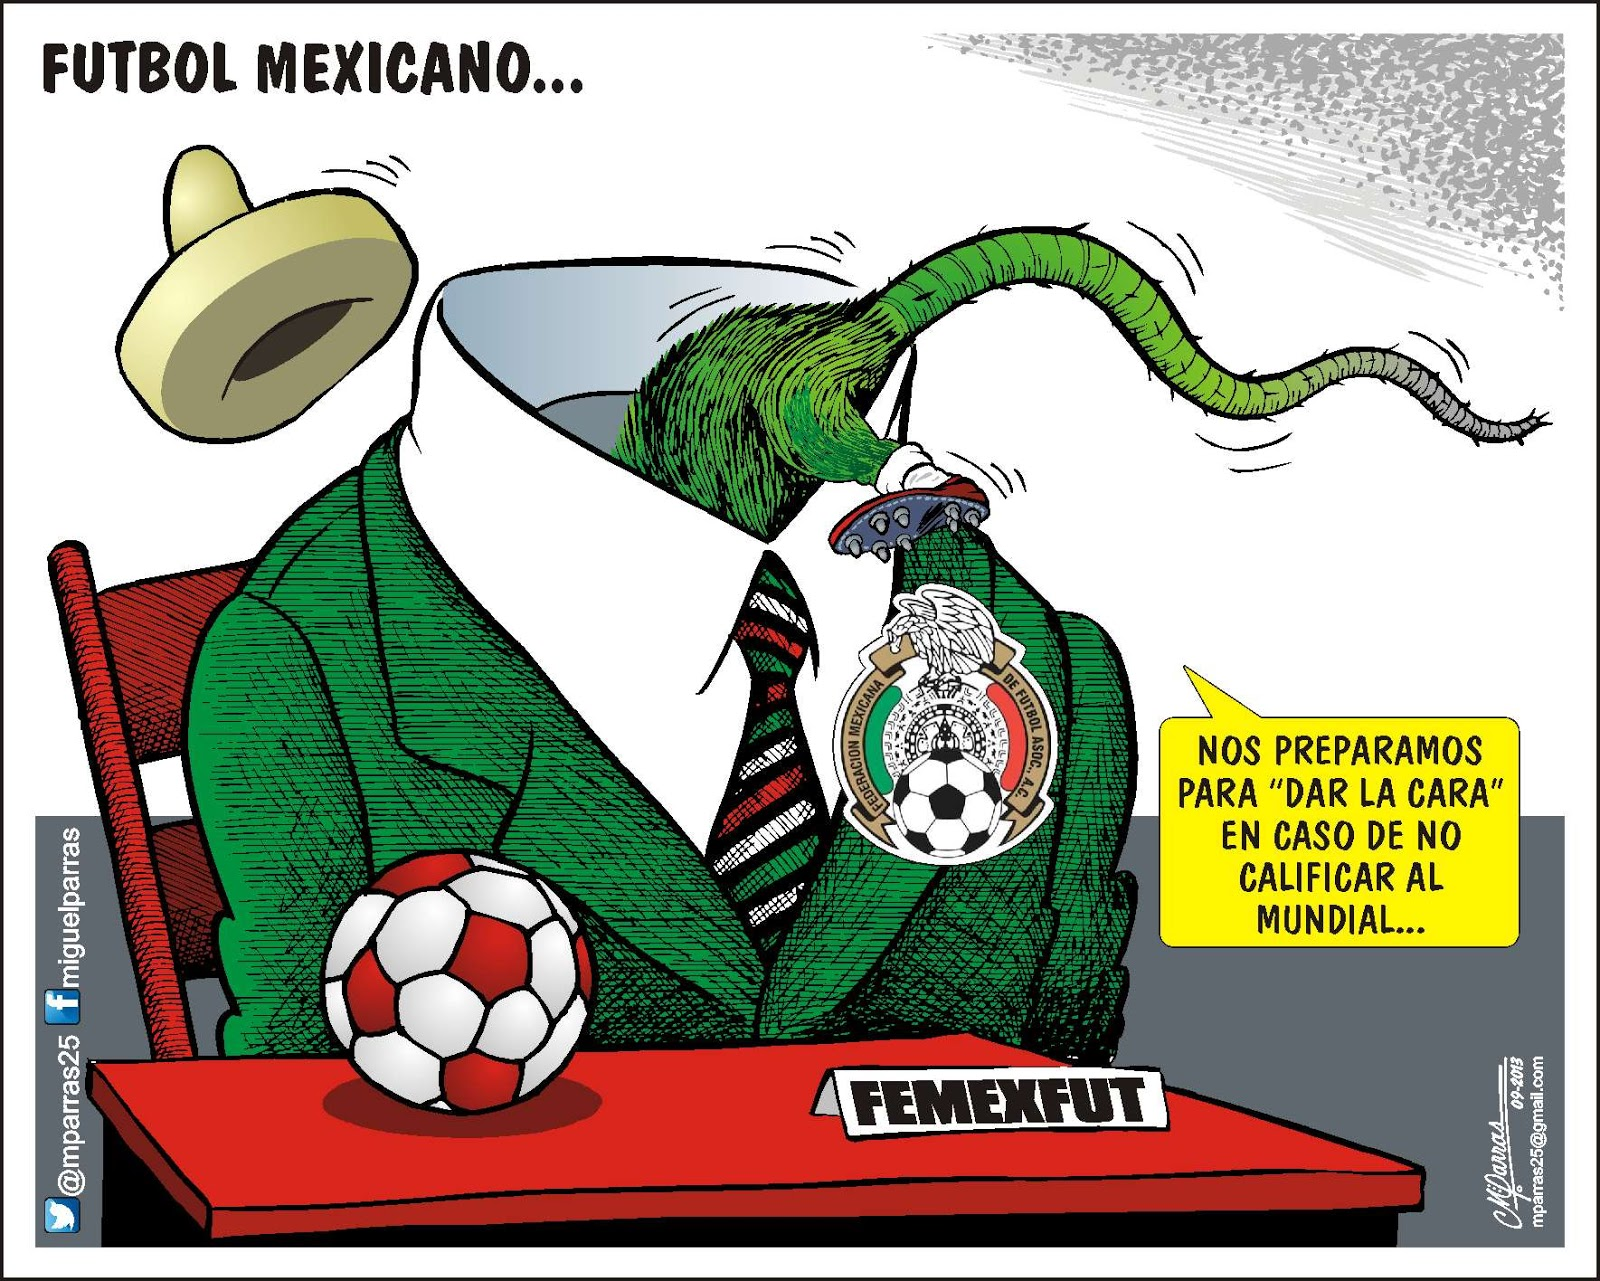 futbol mexicano 1 a: